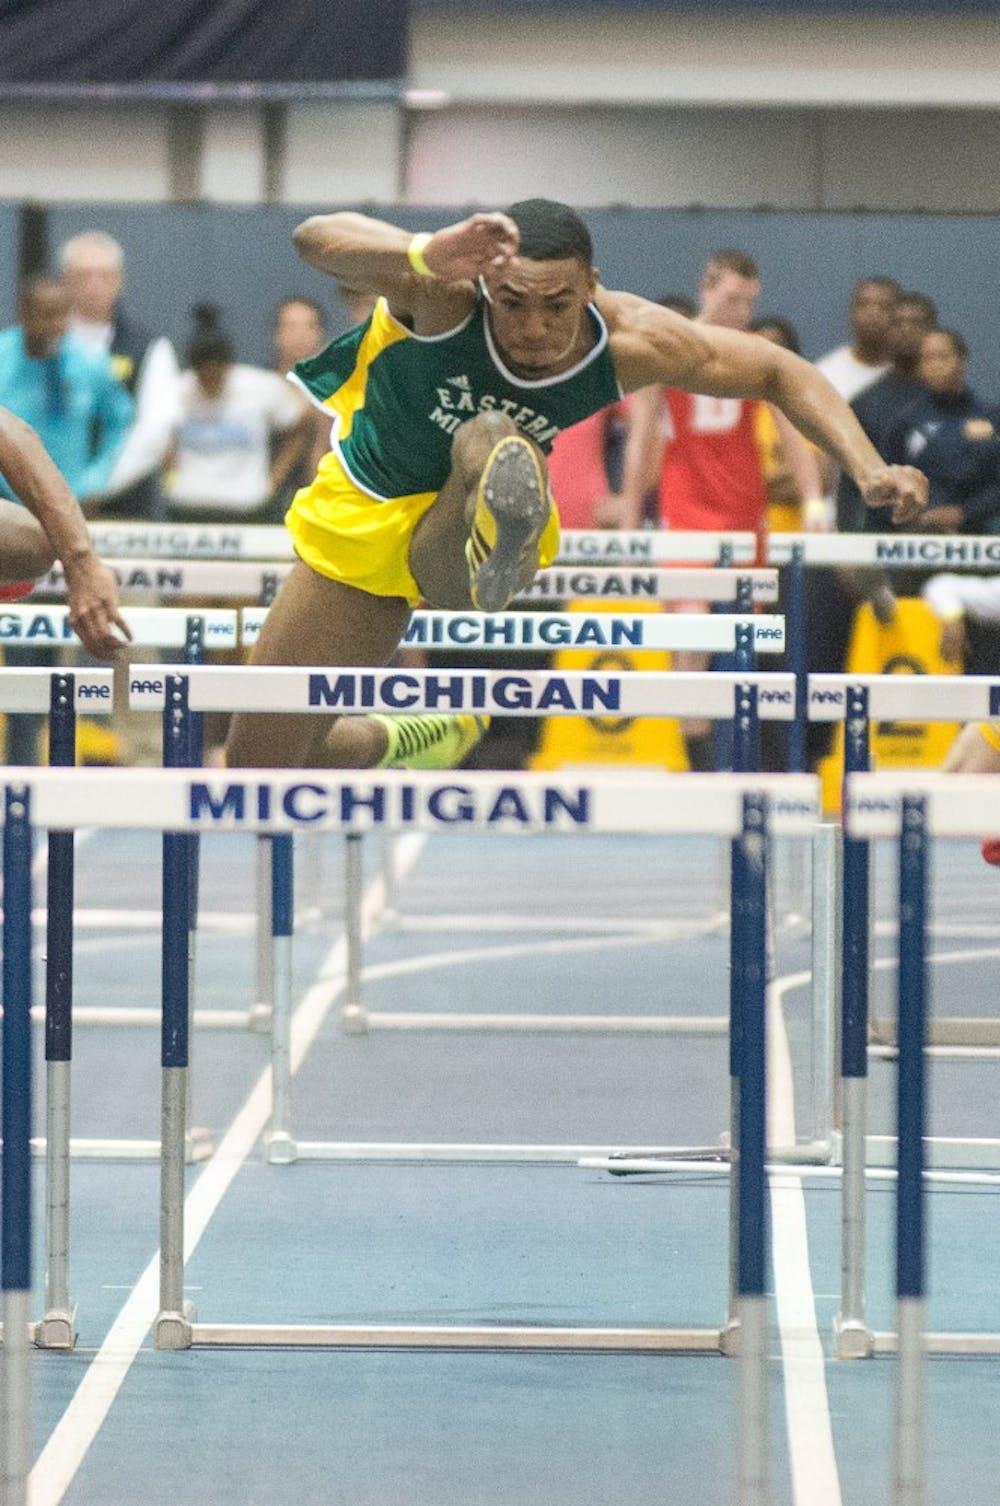 Men's track team competes at Michigan